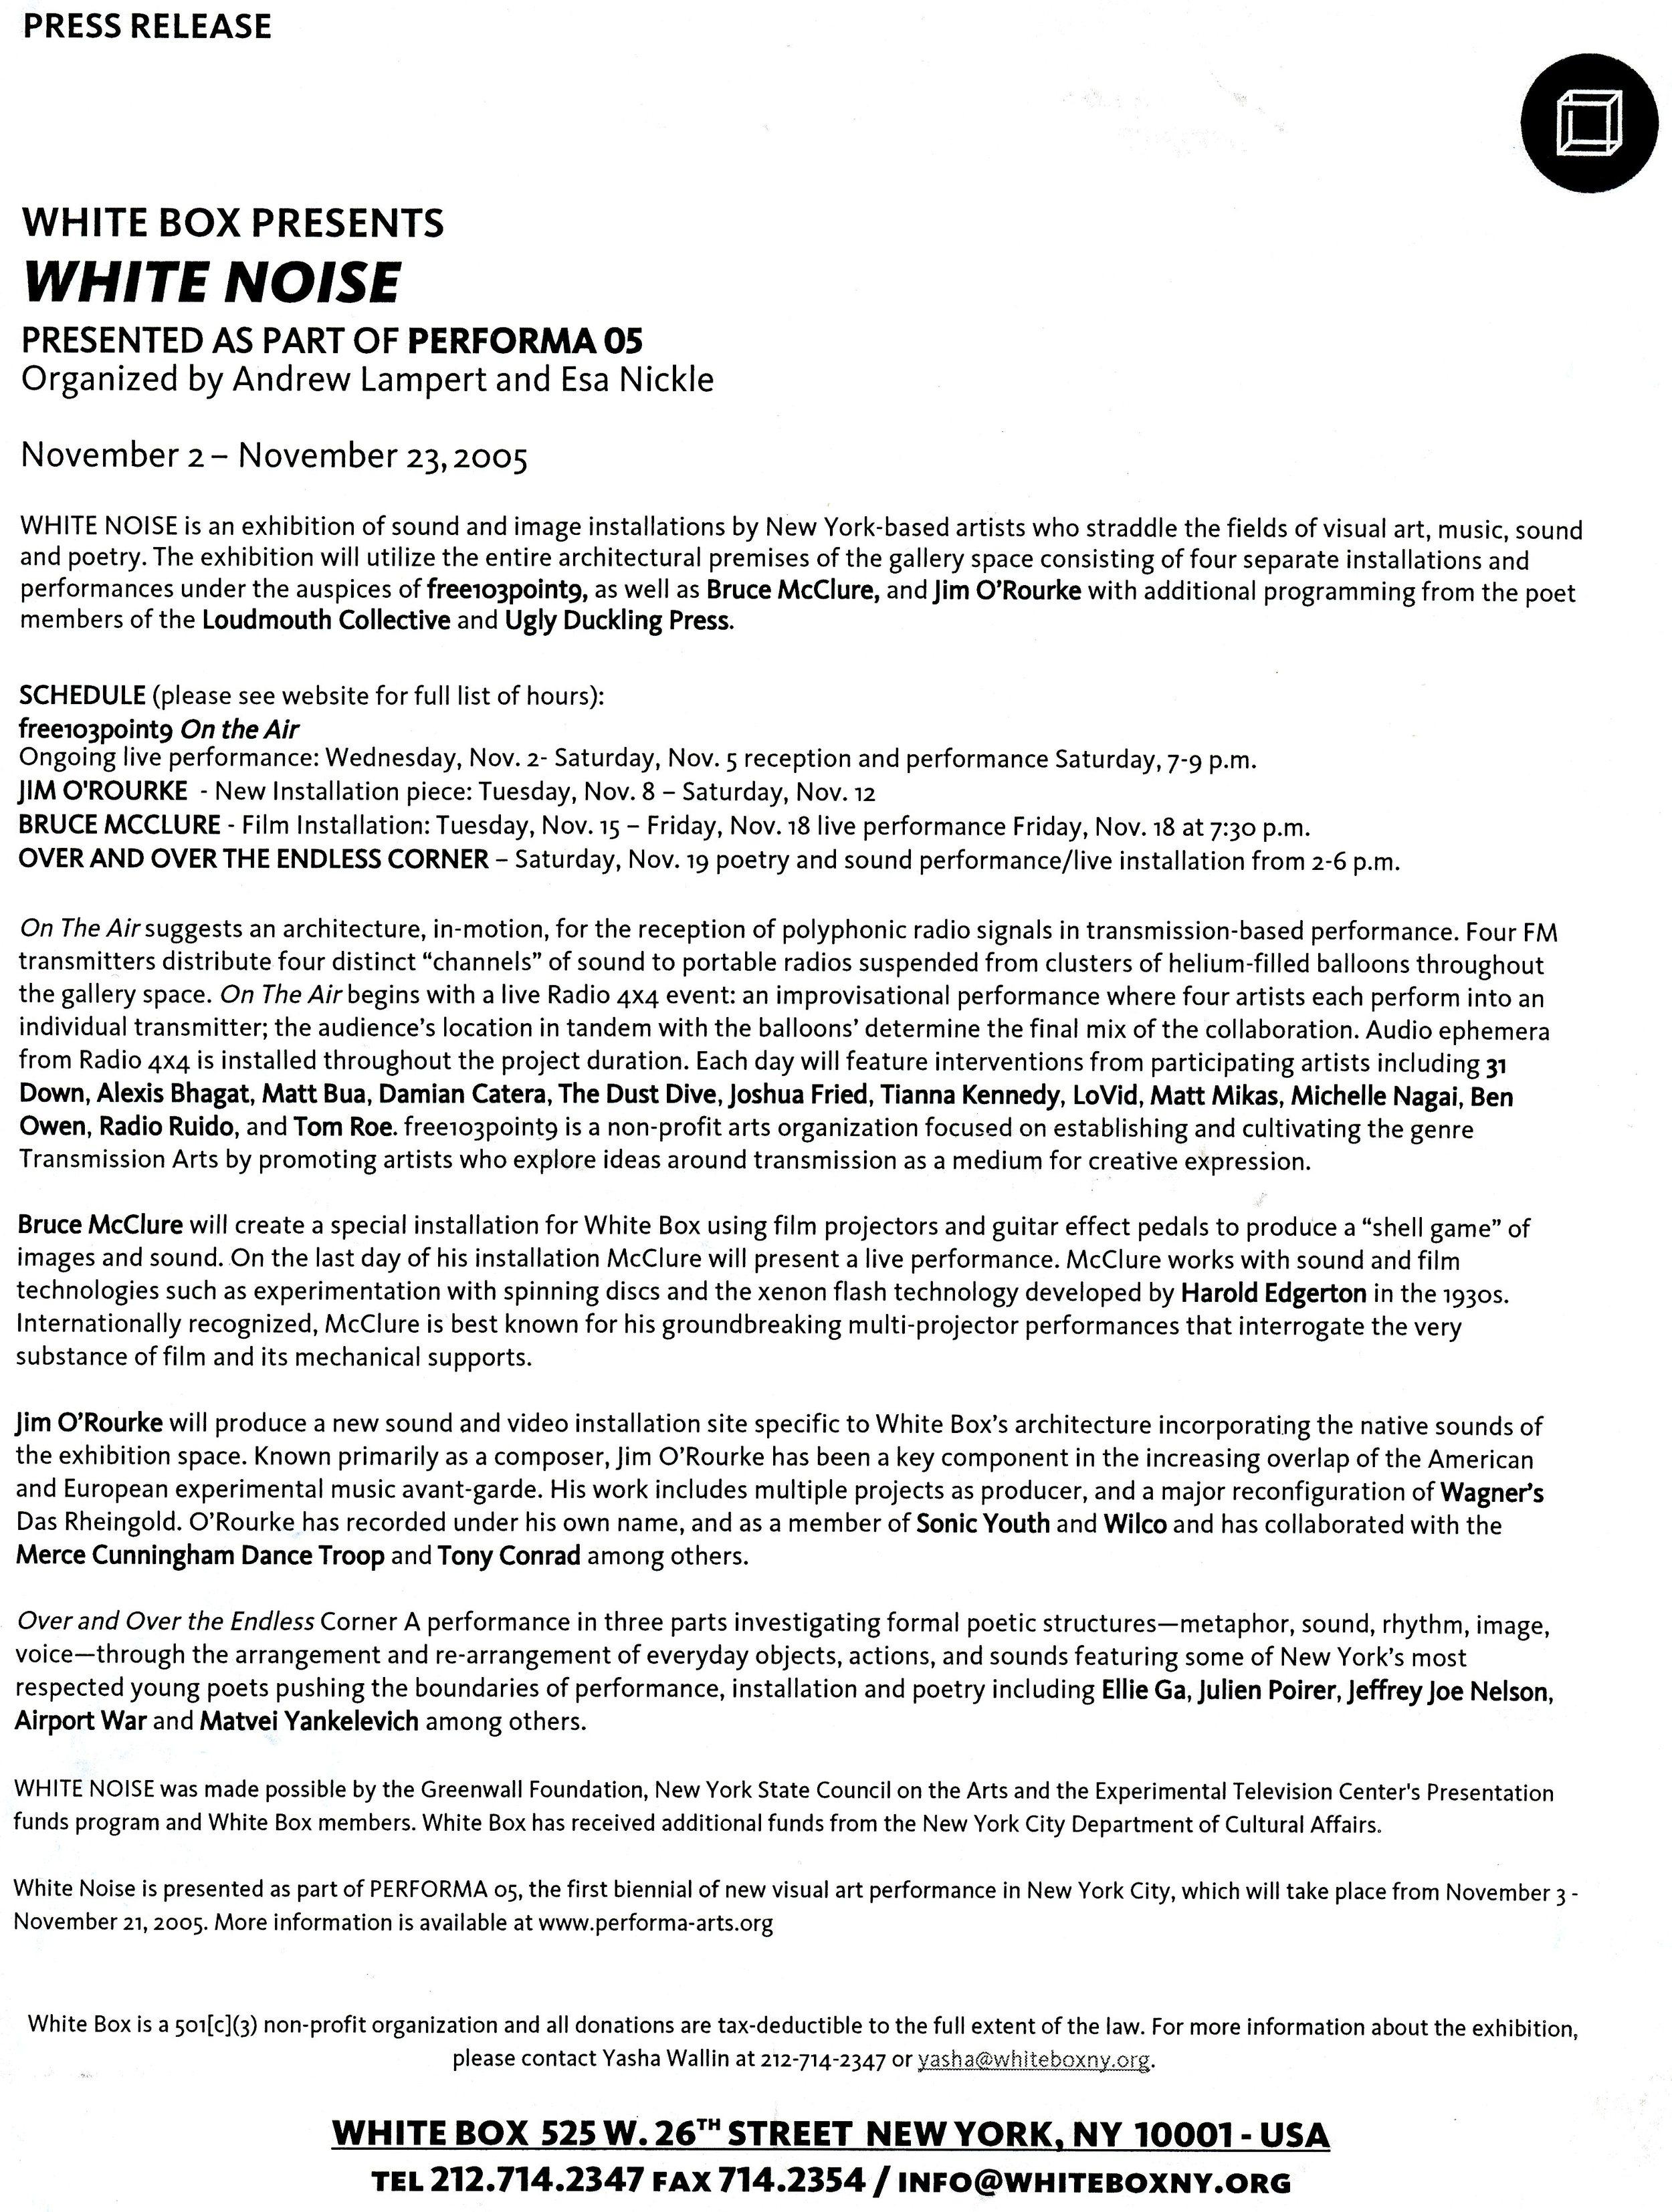 whitenoisepressrelease197.jpg